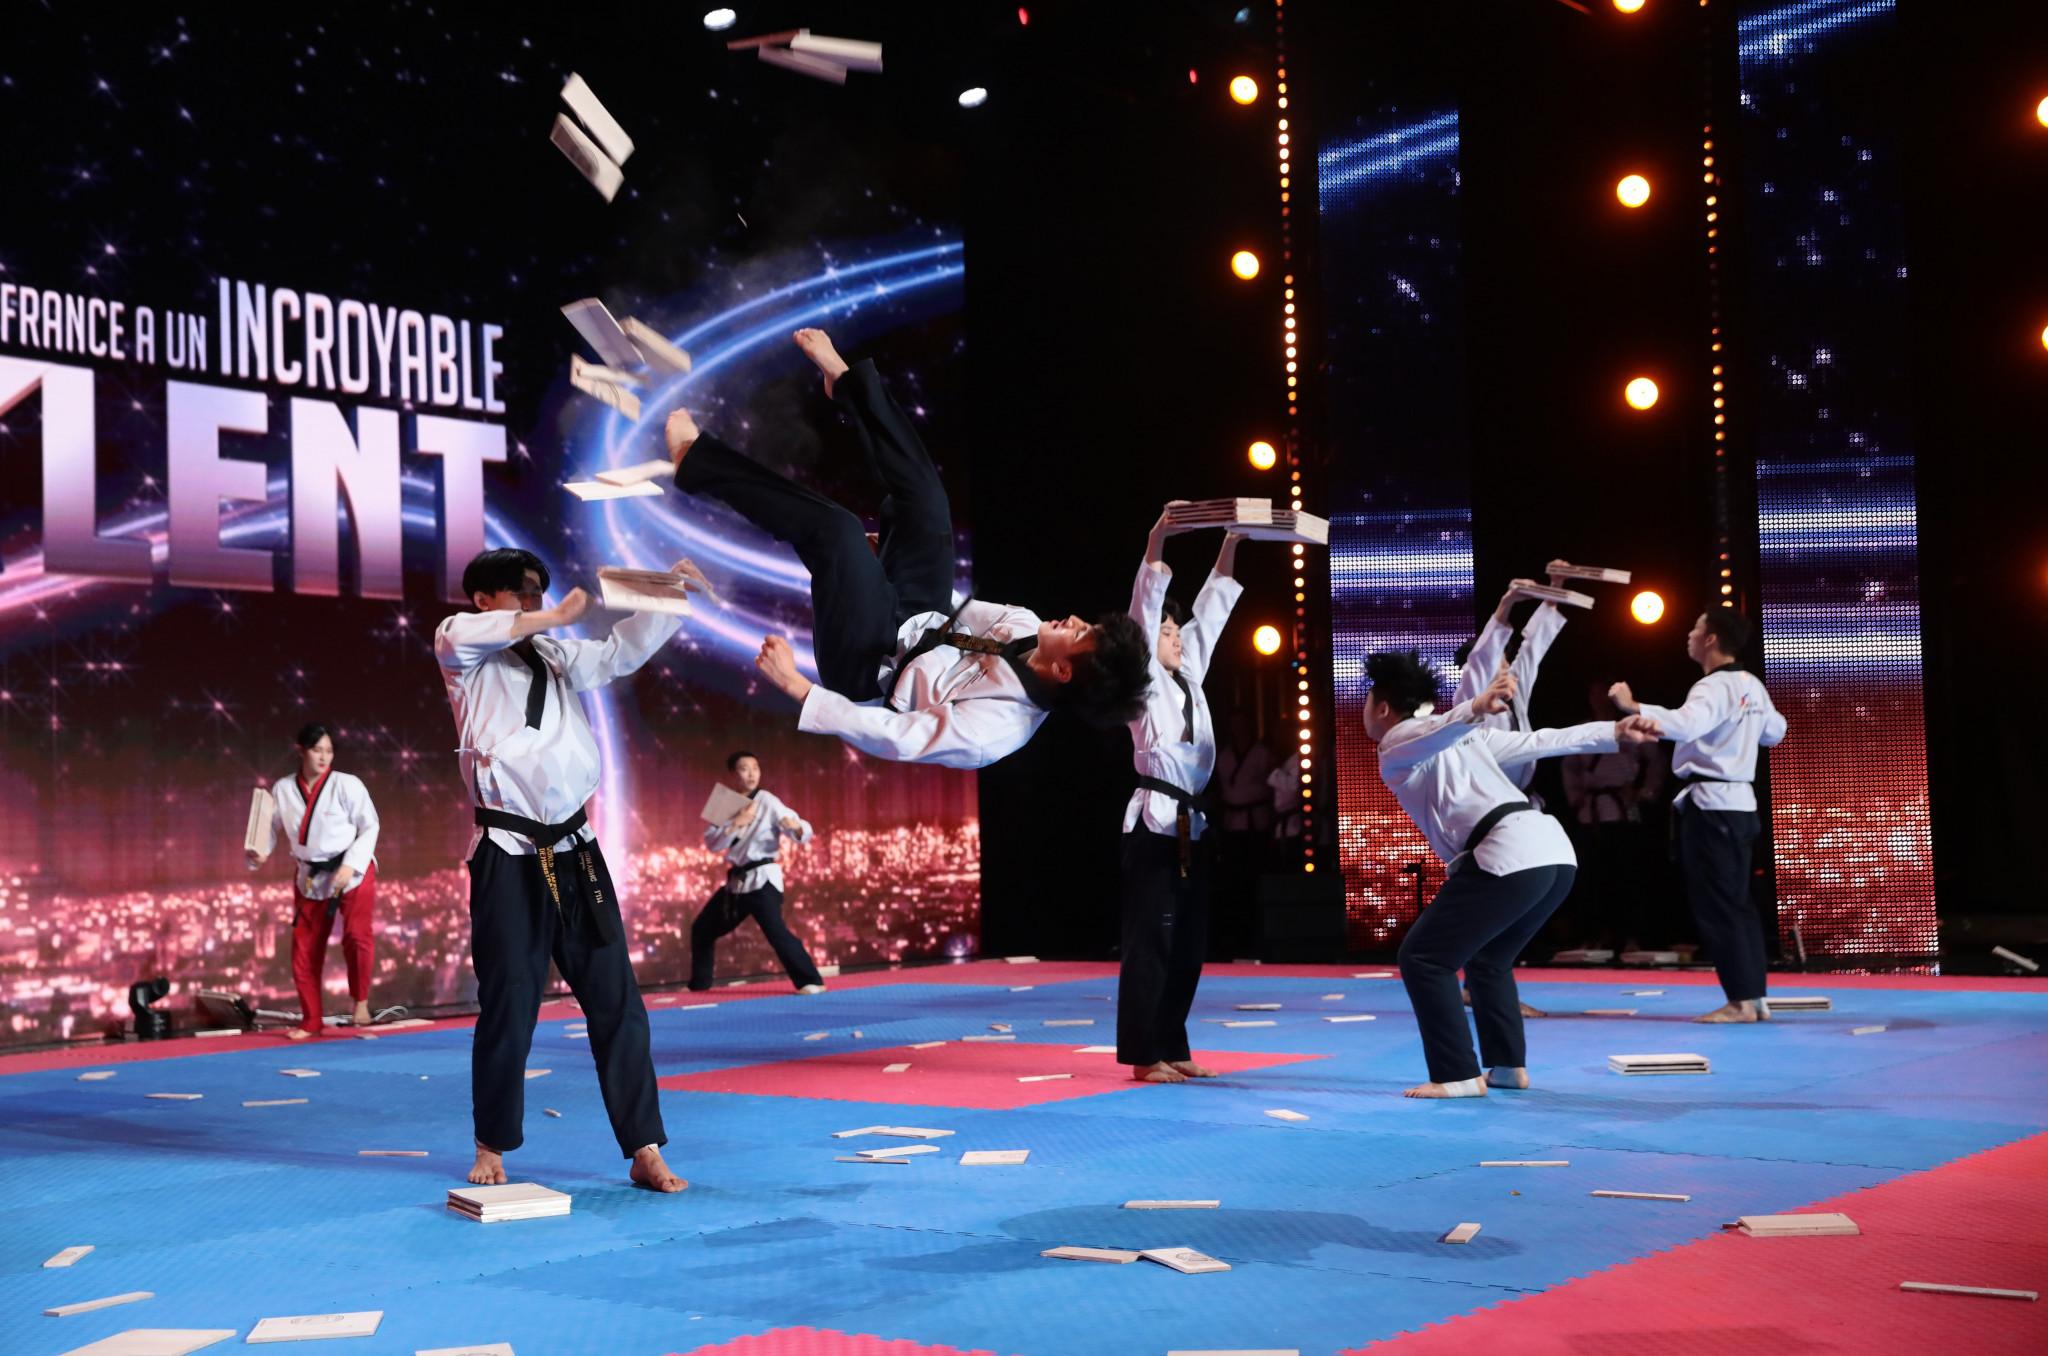 World Taekwondo demonstration team impresses on France's Got Talent